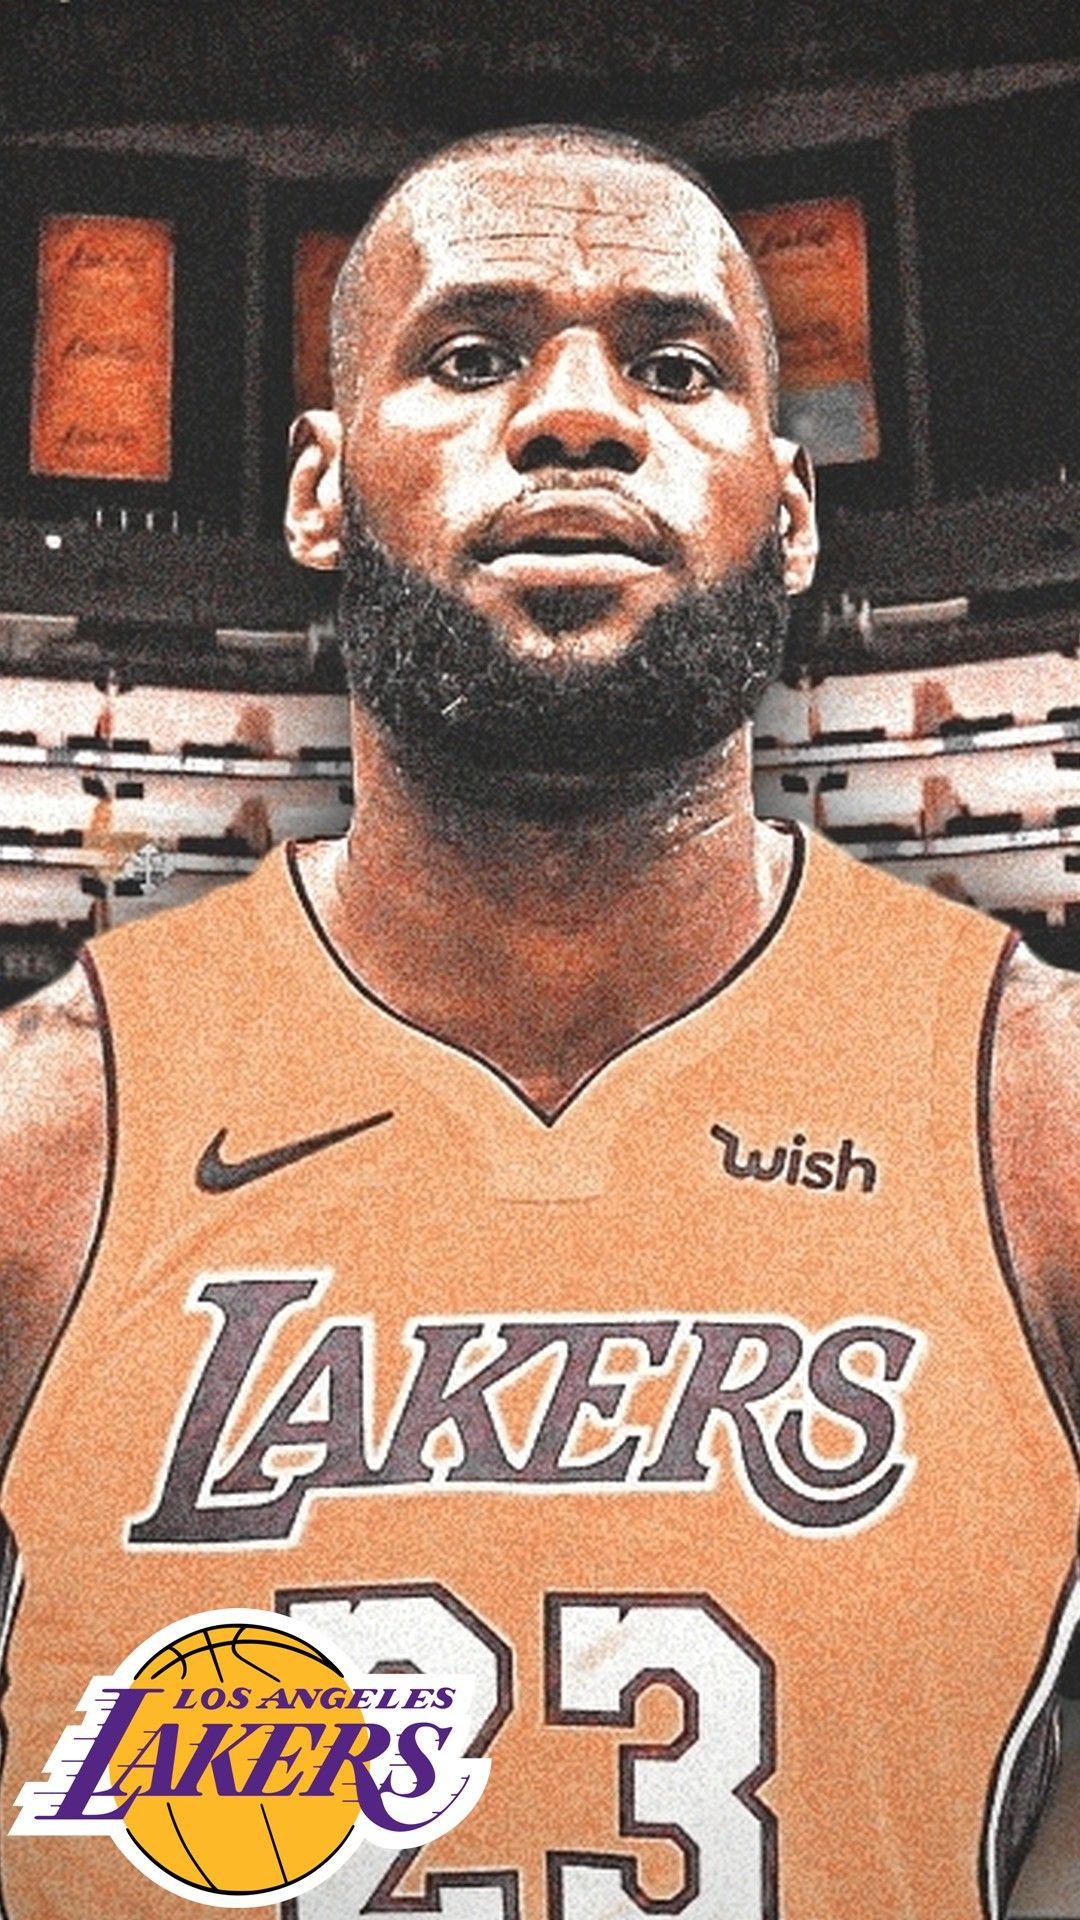 iPhone Wallpaper HD LA Lakers LeBron James Lebron james